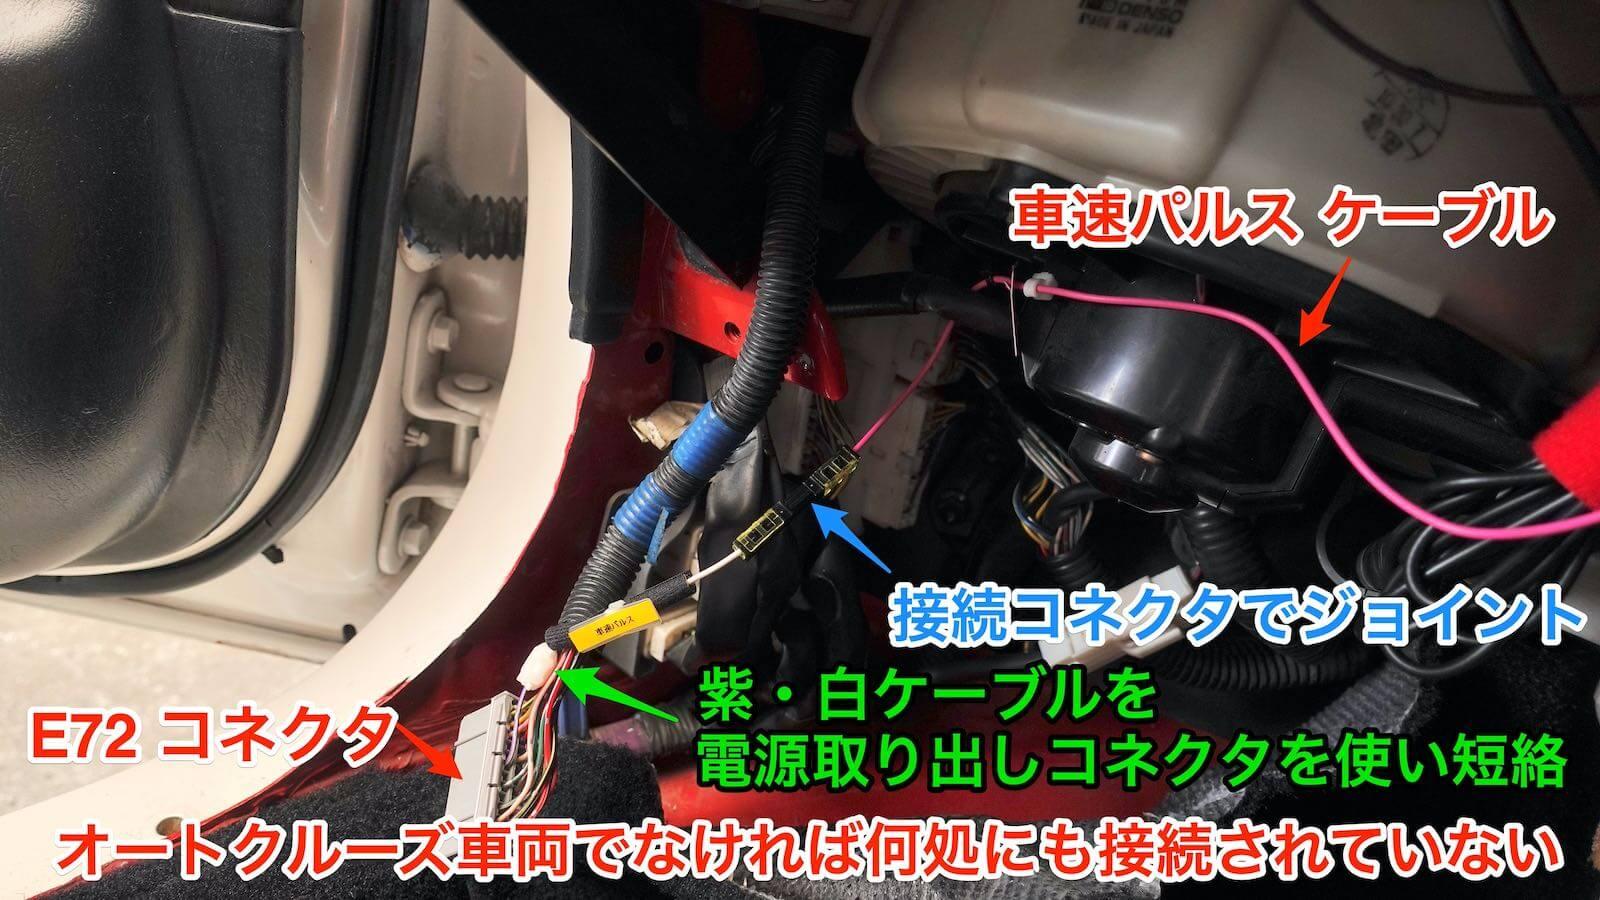 MR2 vehicle speed pulse short circuit